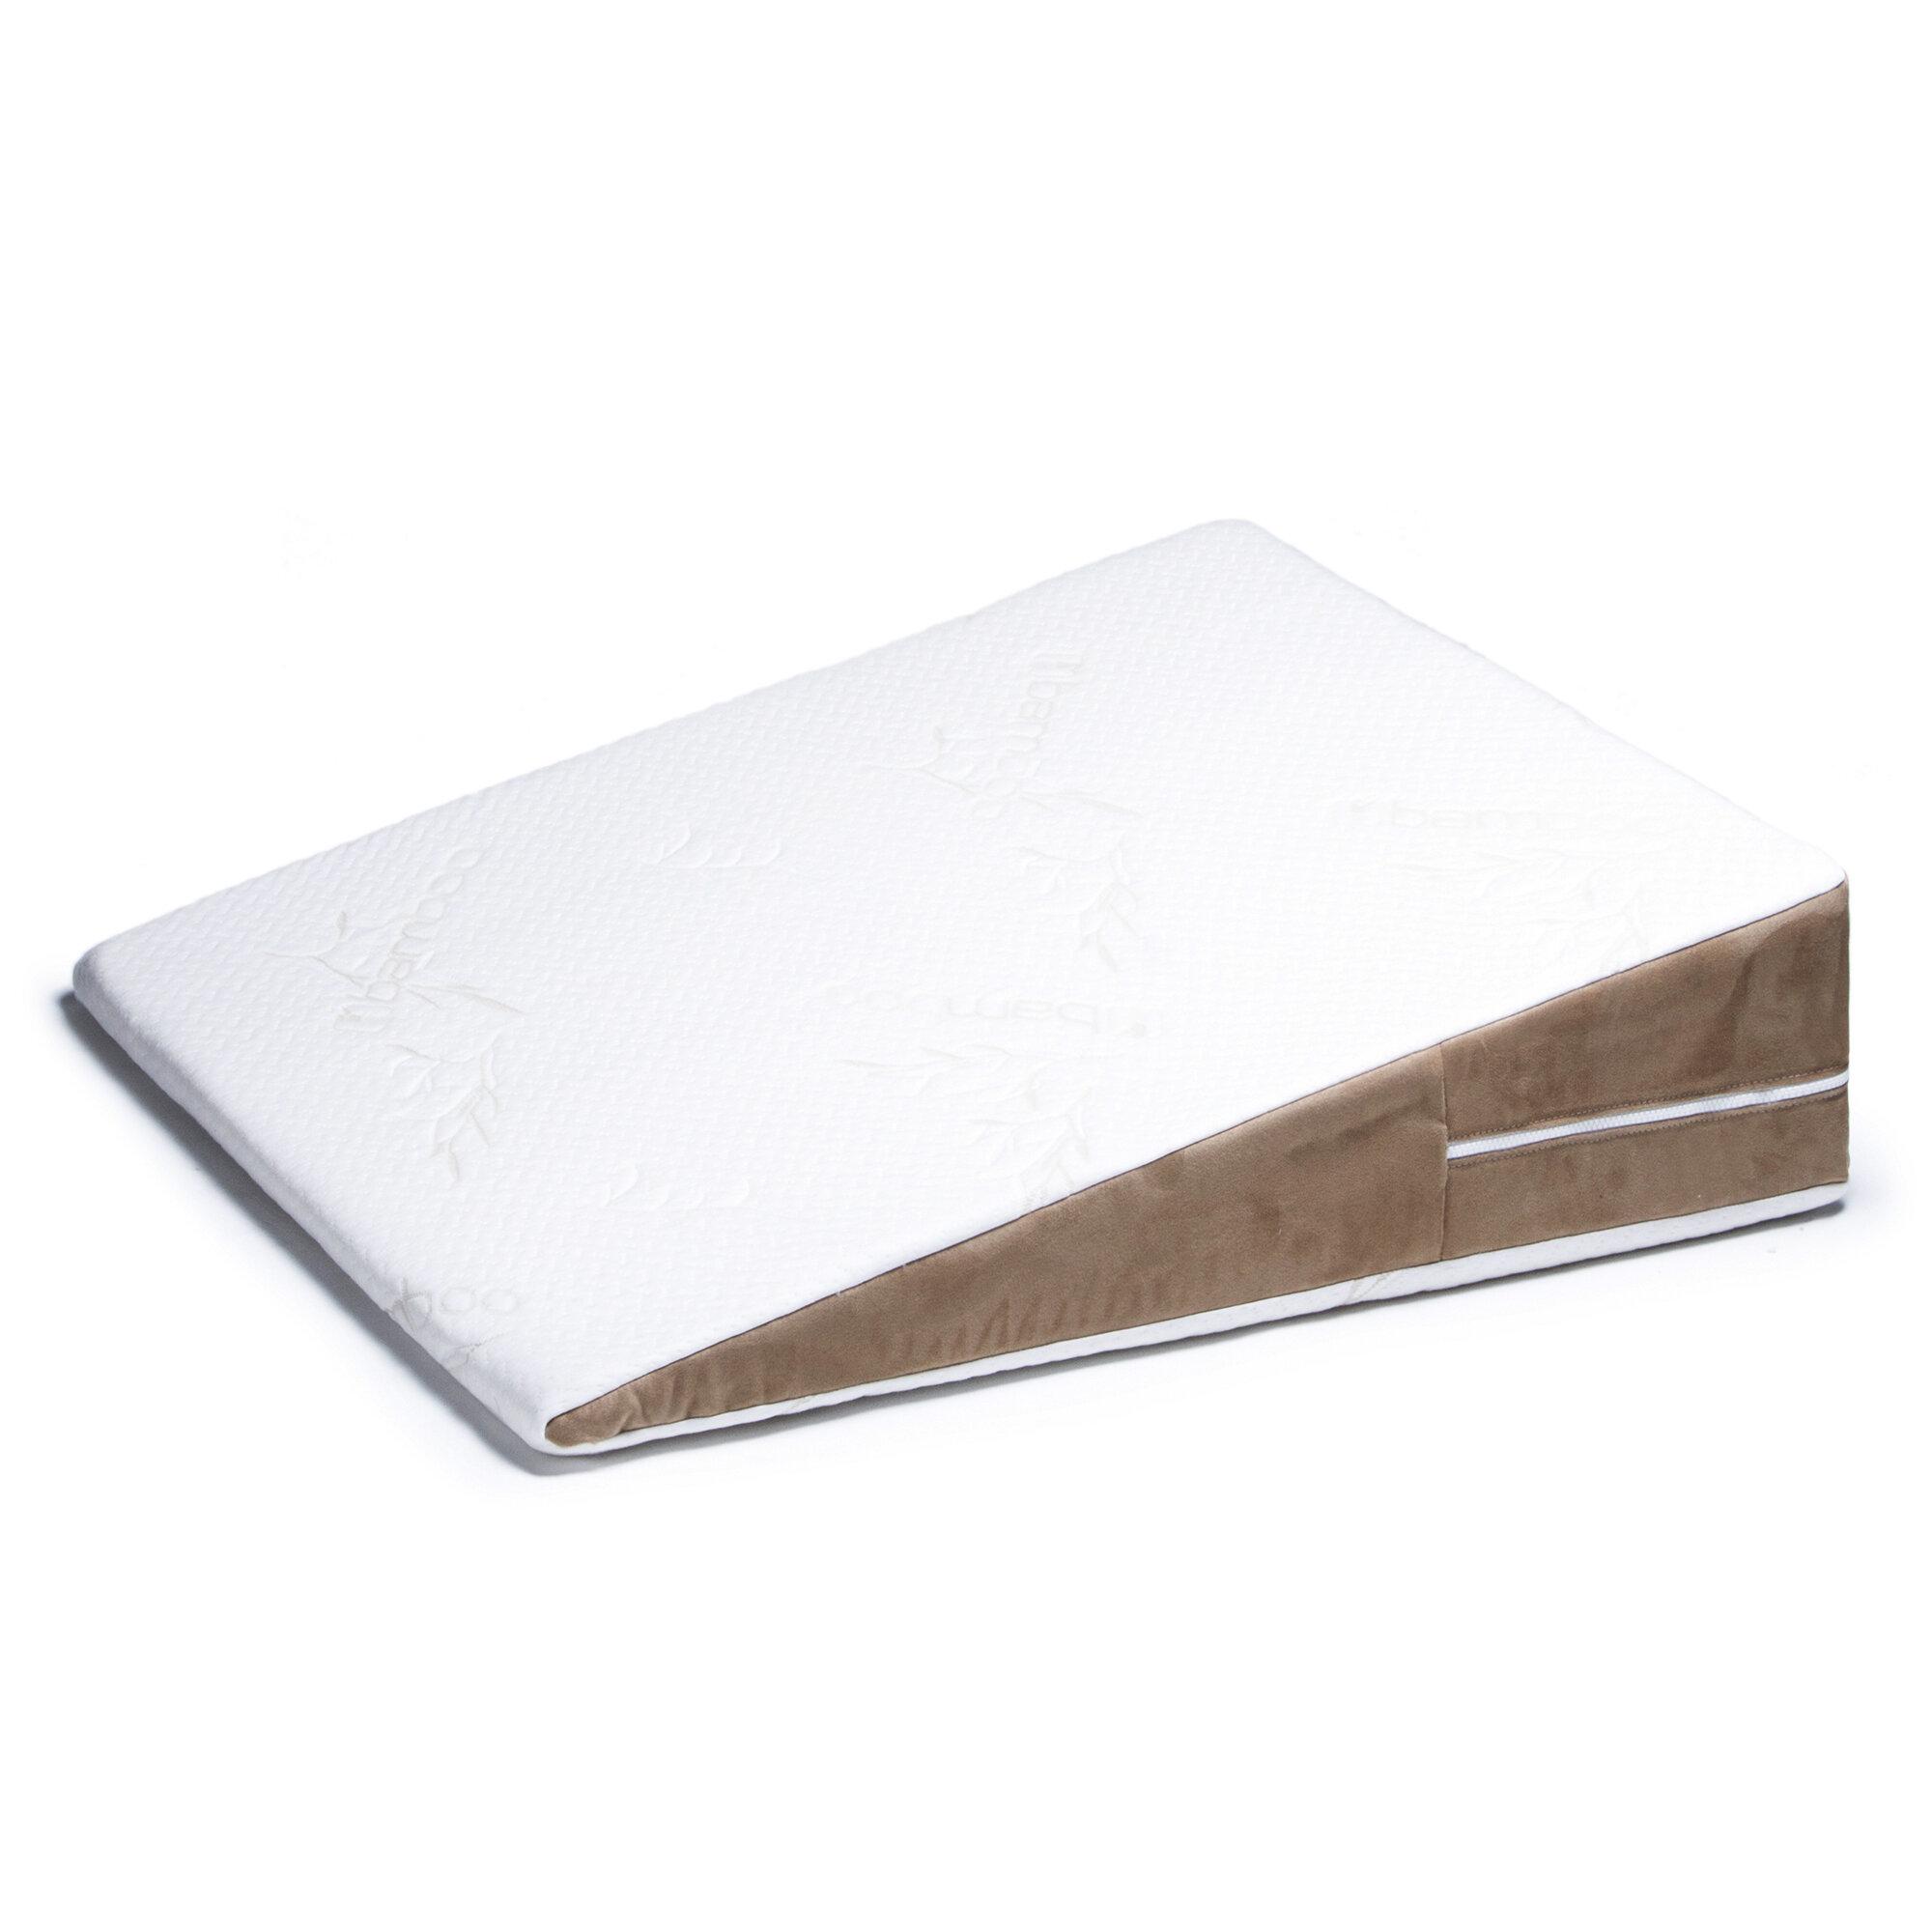 avana avana bed wedge memory foam pillow ebay